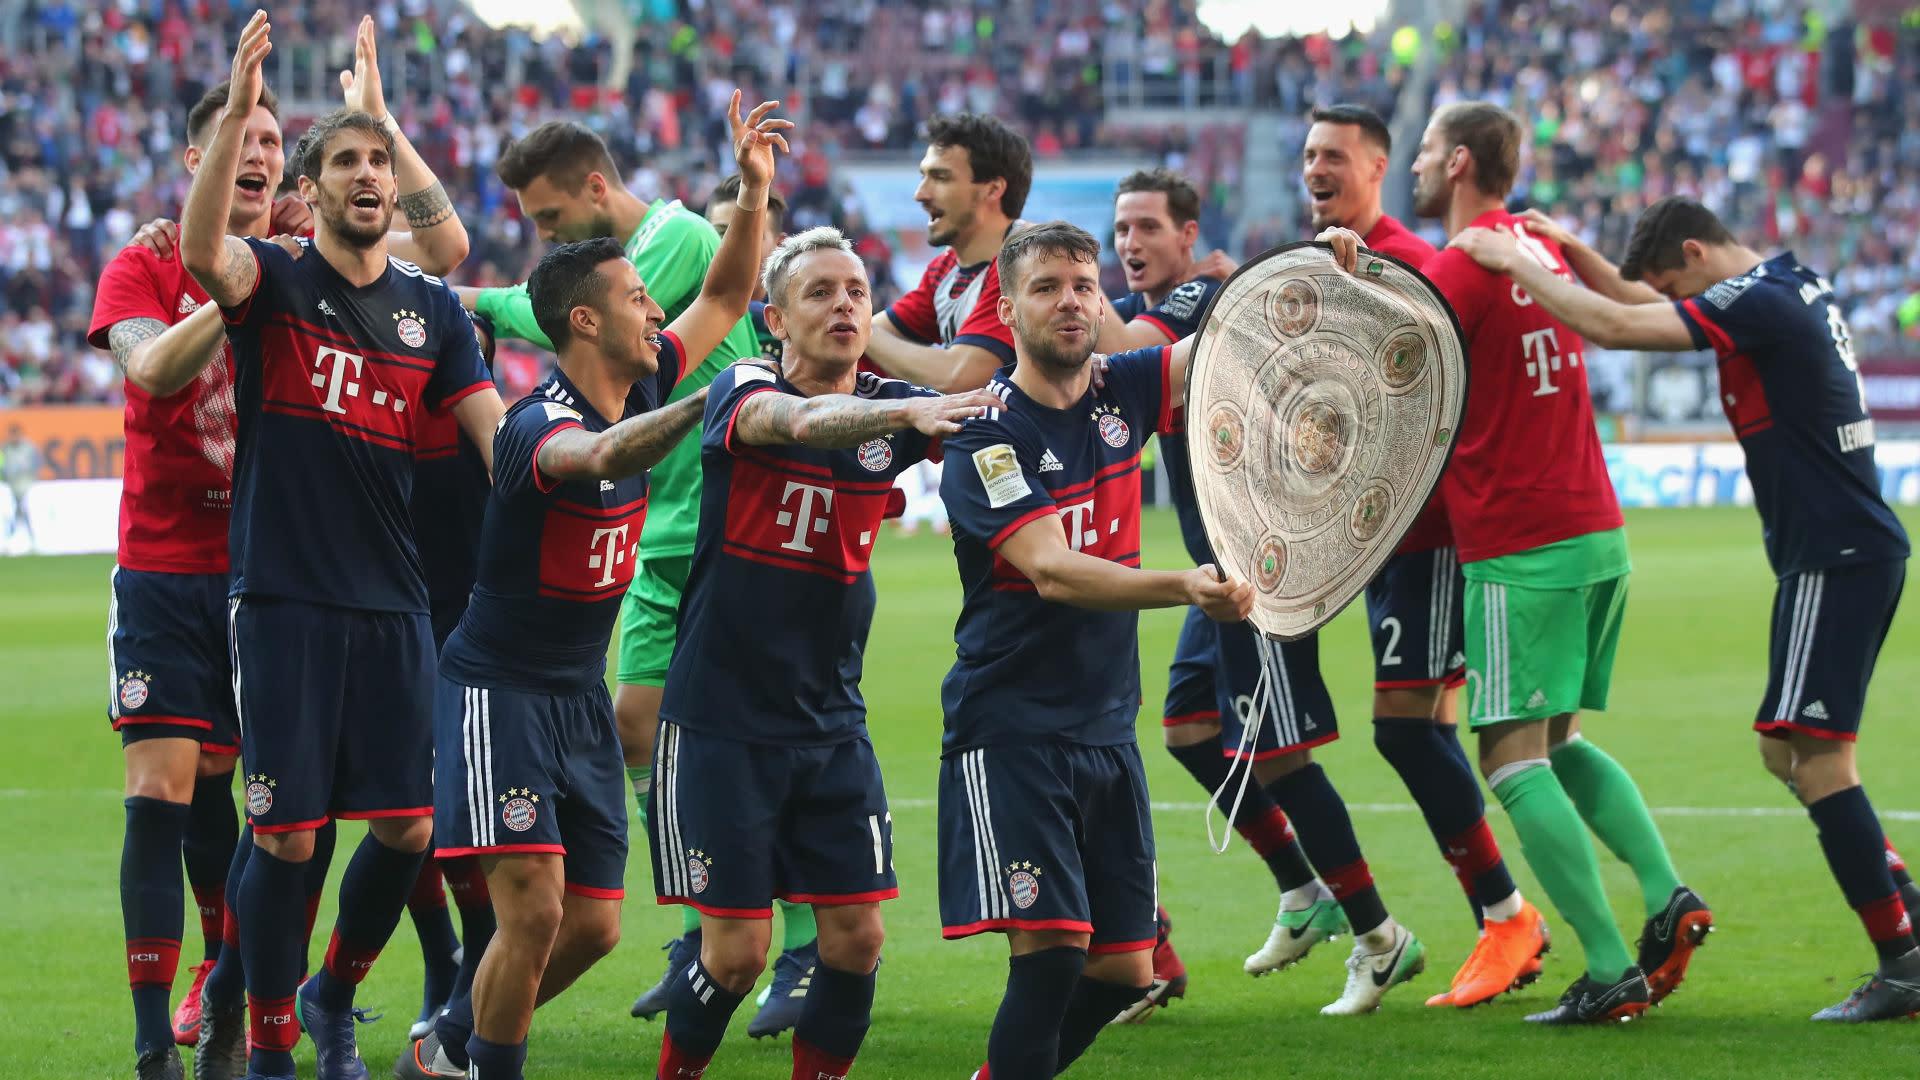 bundesliga champions league